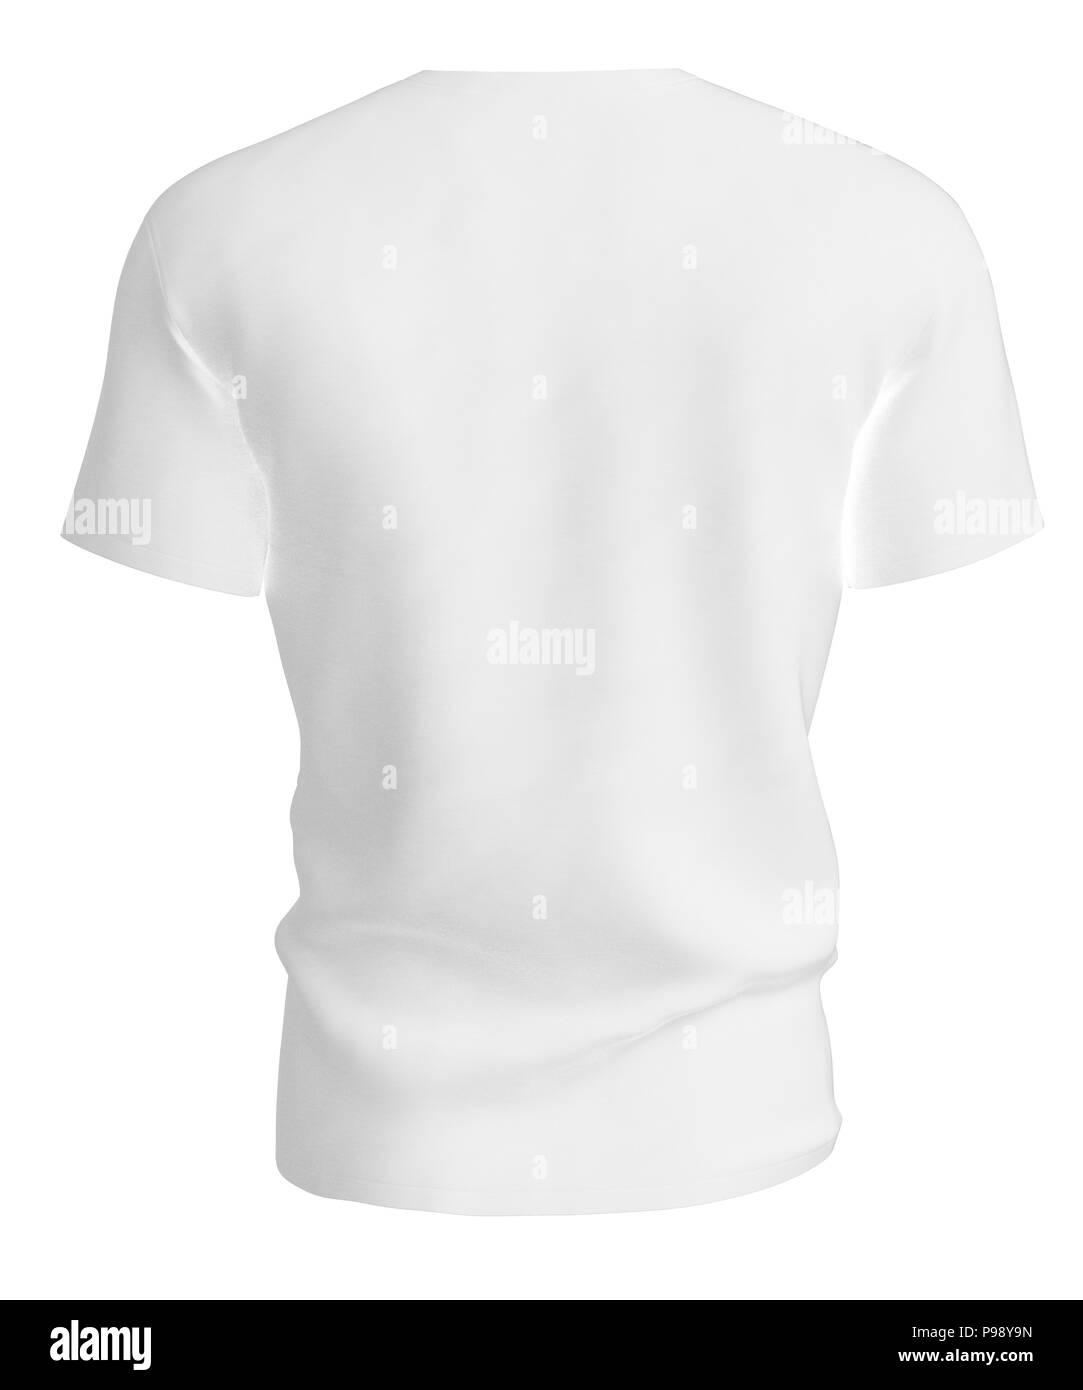 Isolati Sfondo Template Uomo T Bianco Shirt Su Design HDW2E9YI